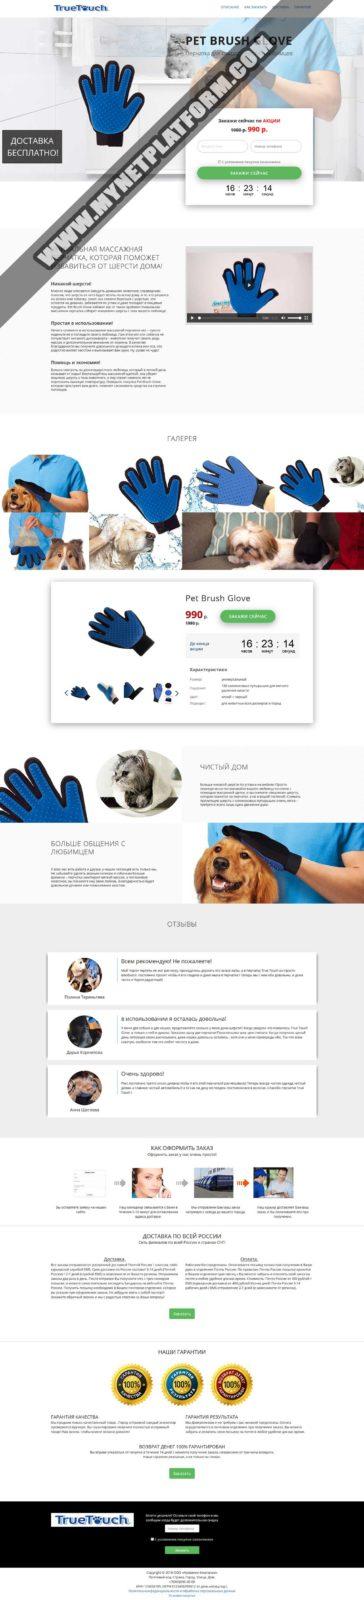 Скриншот лендинга Pet Brush Glove Перчатка для снятия шерсти 001